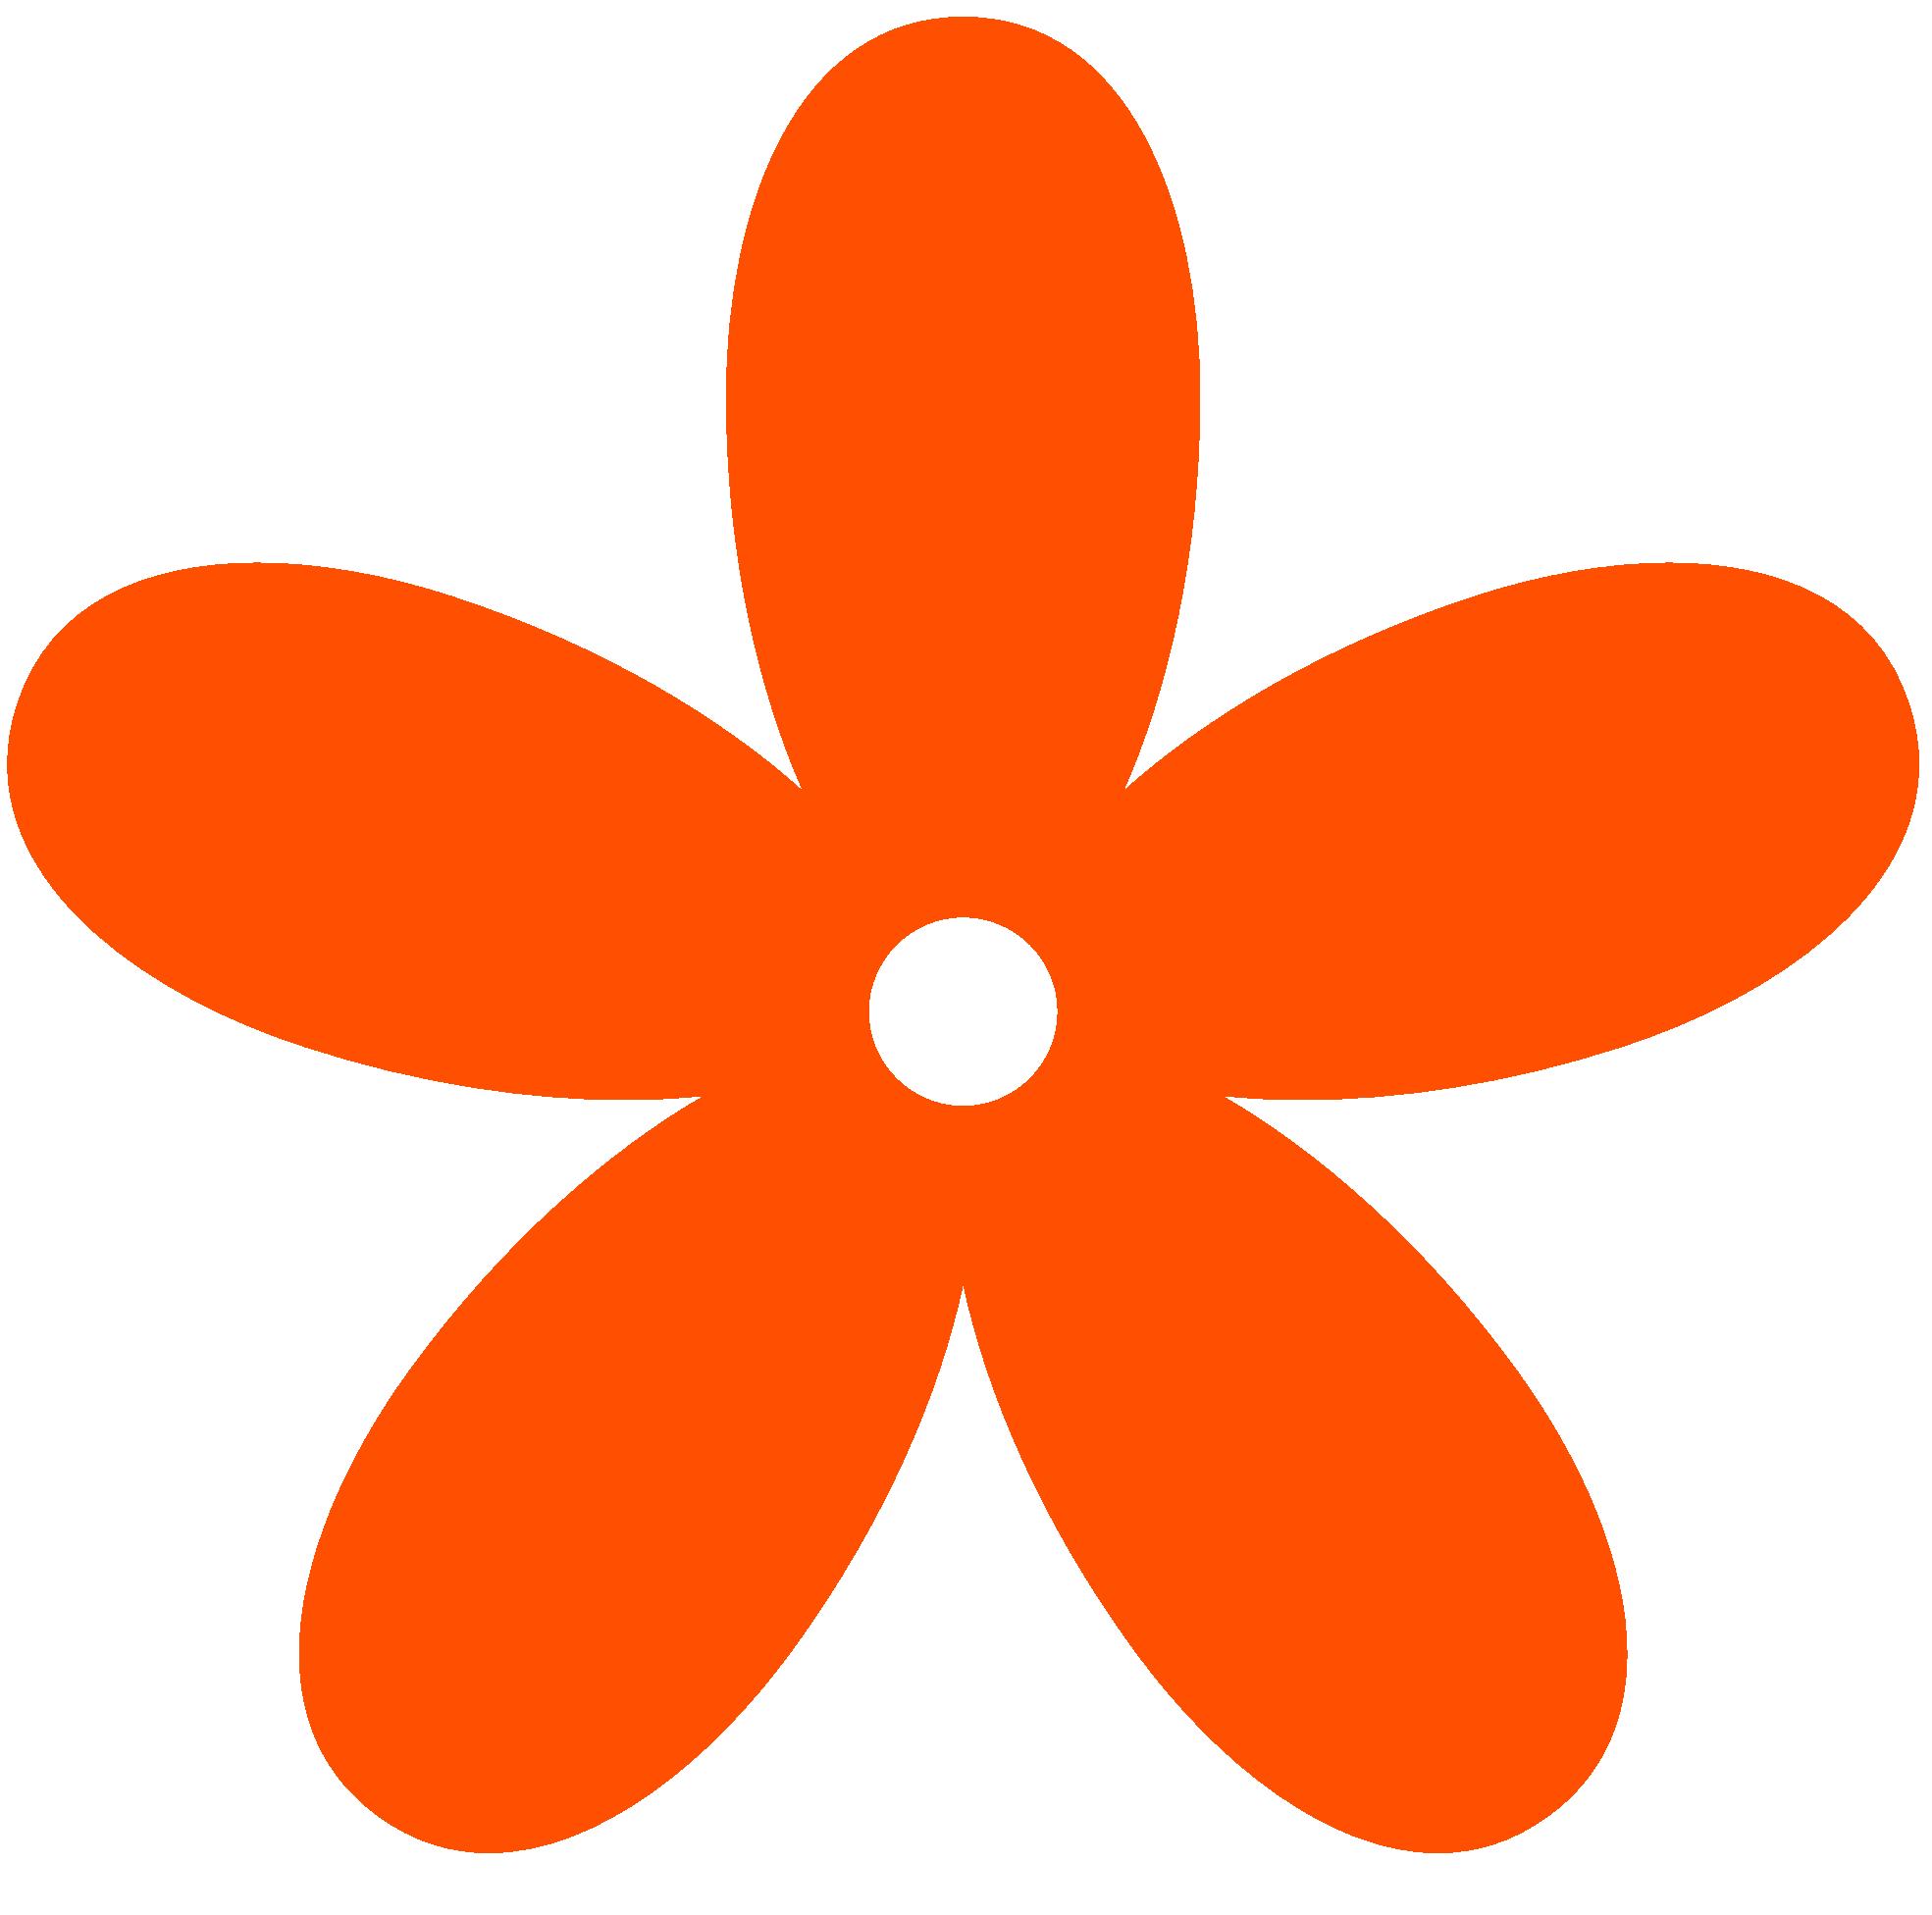 Orange Color Clipart | Free download best Orange Color Clipart on ...